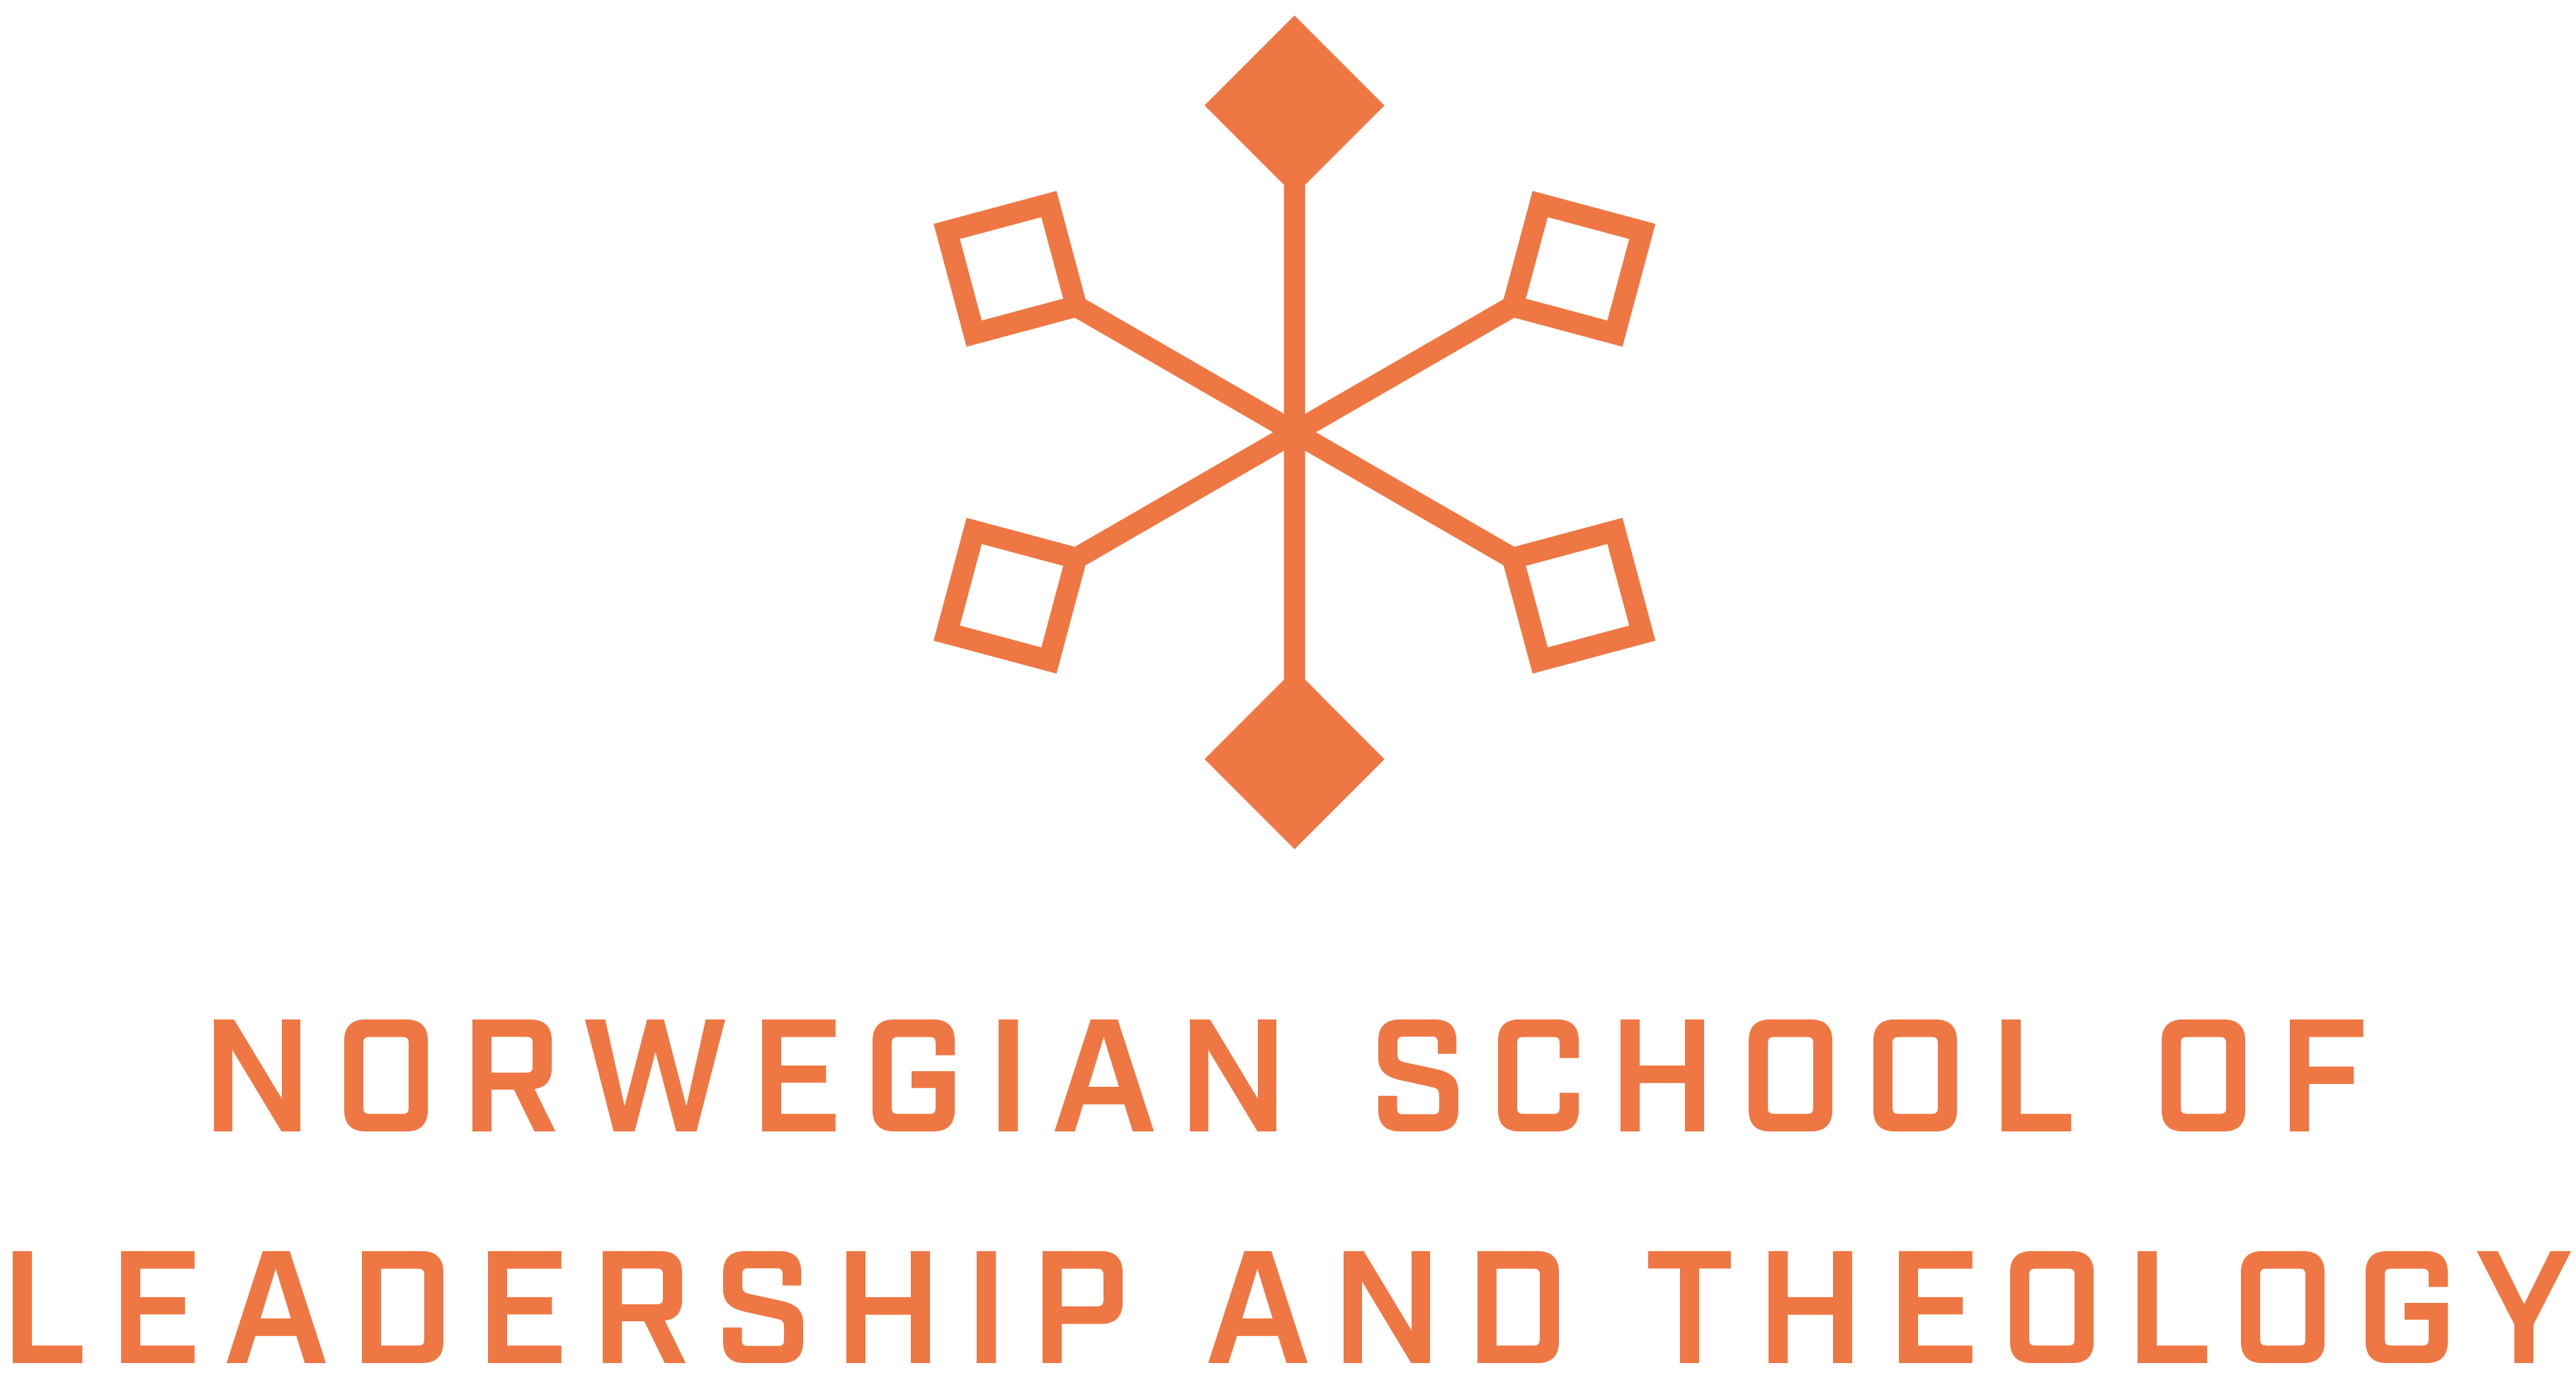 Norwegian School of Leadership and Theology